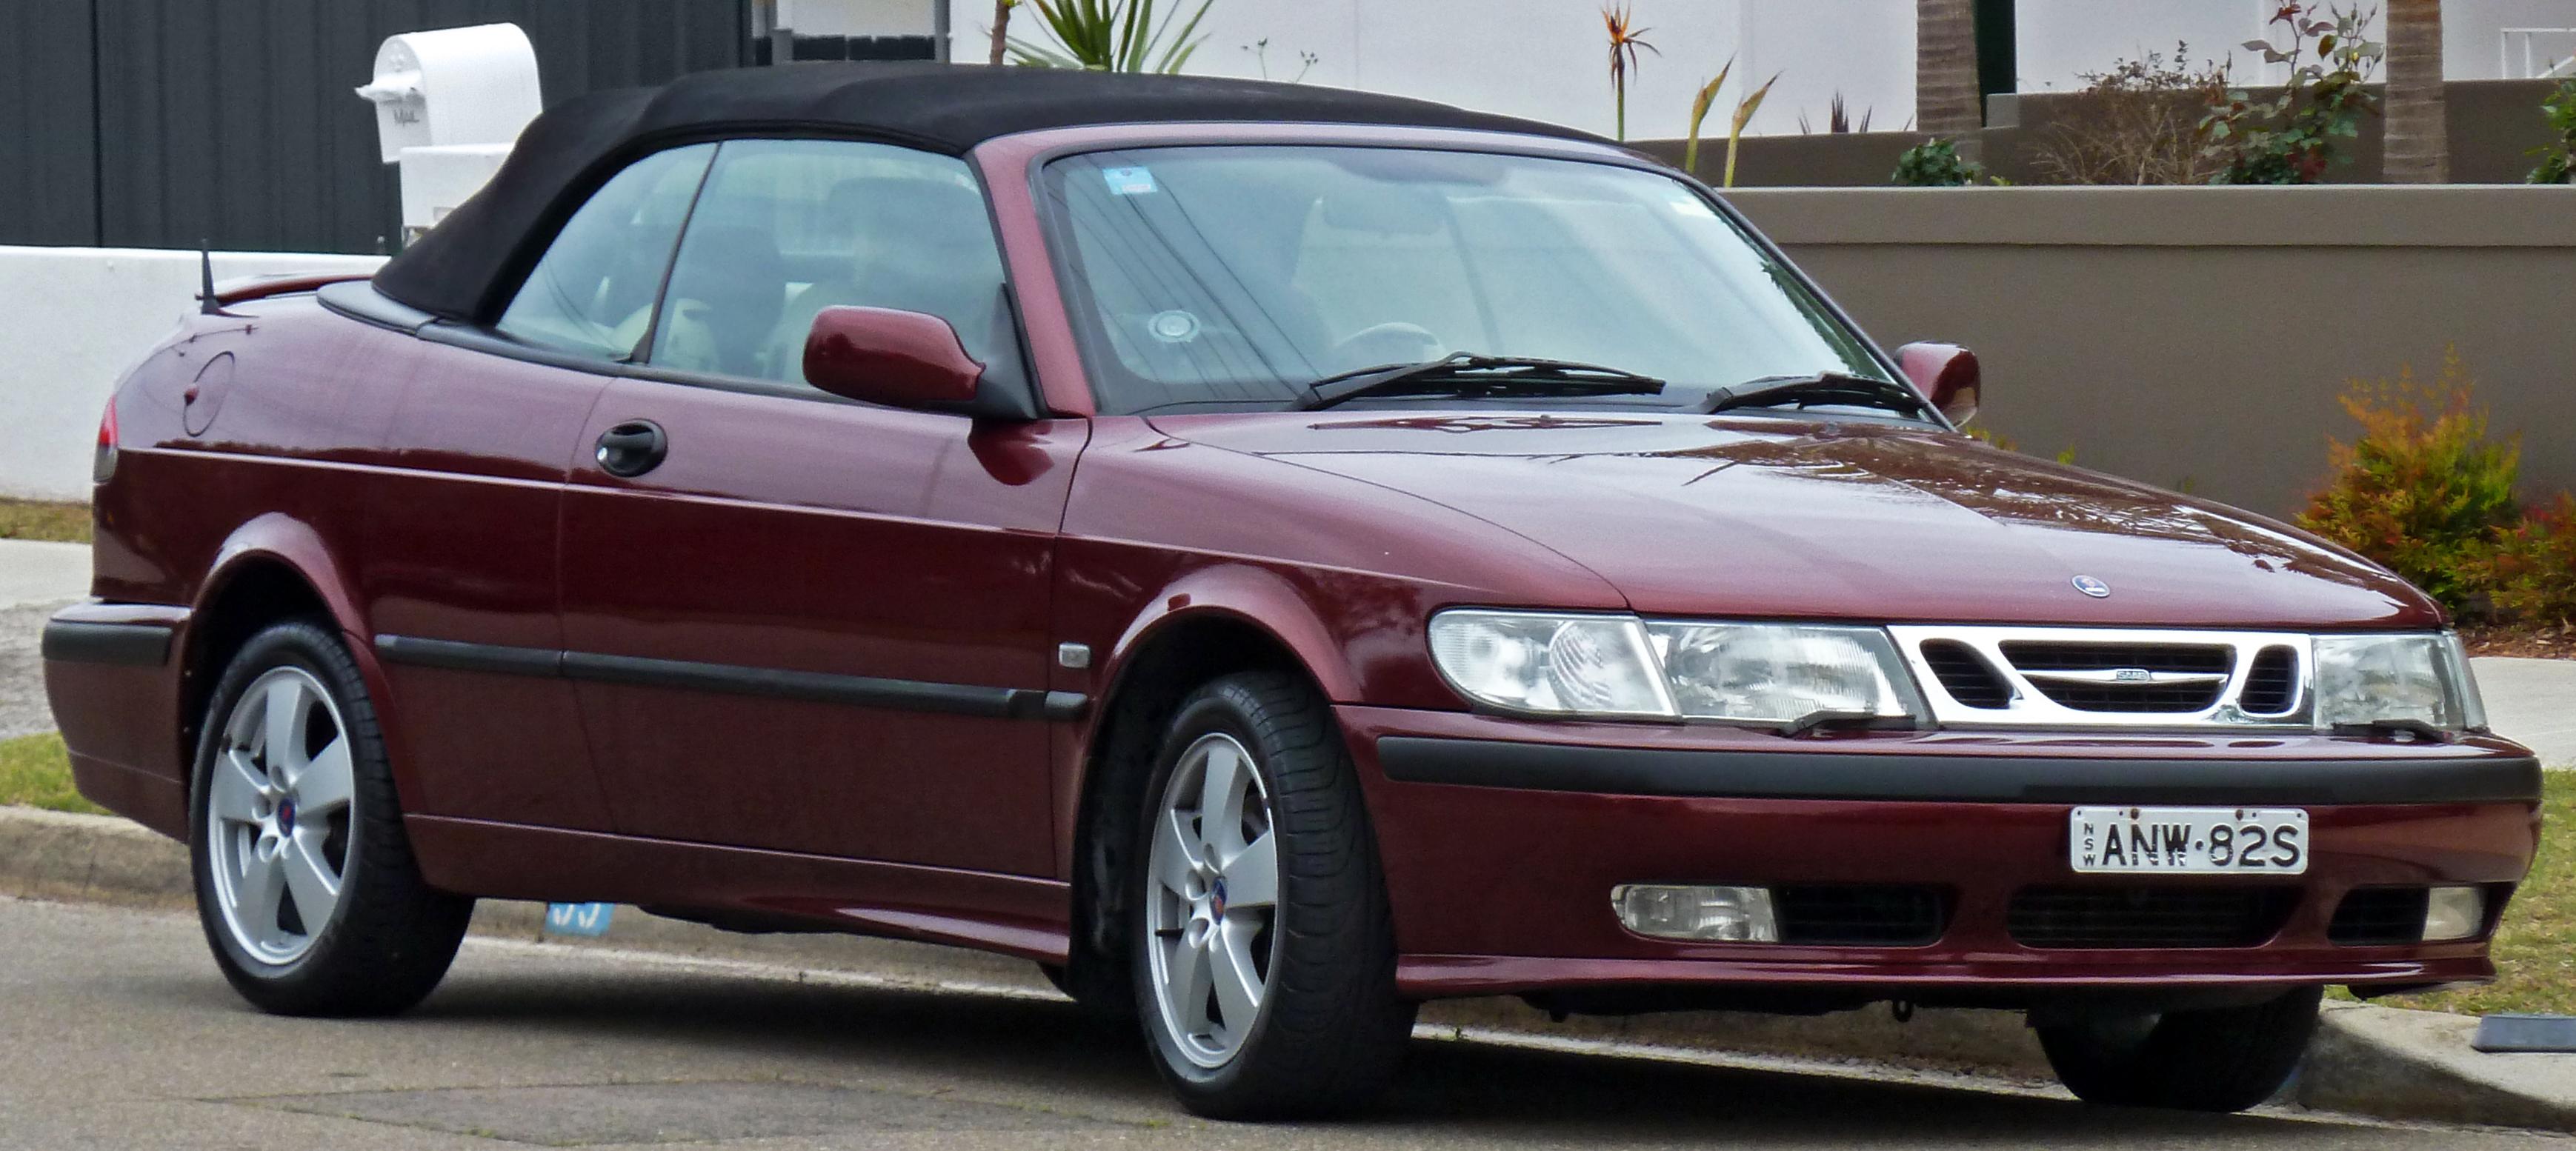 File 2001 2002 Saab 9 3 My02 Anniversary Convertible 2010